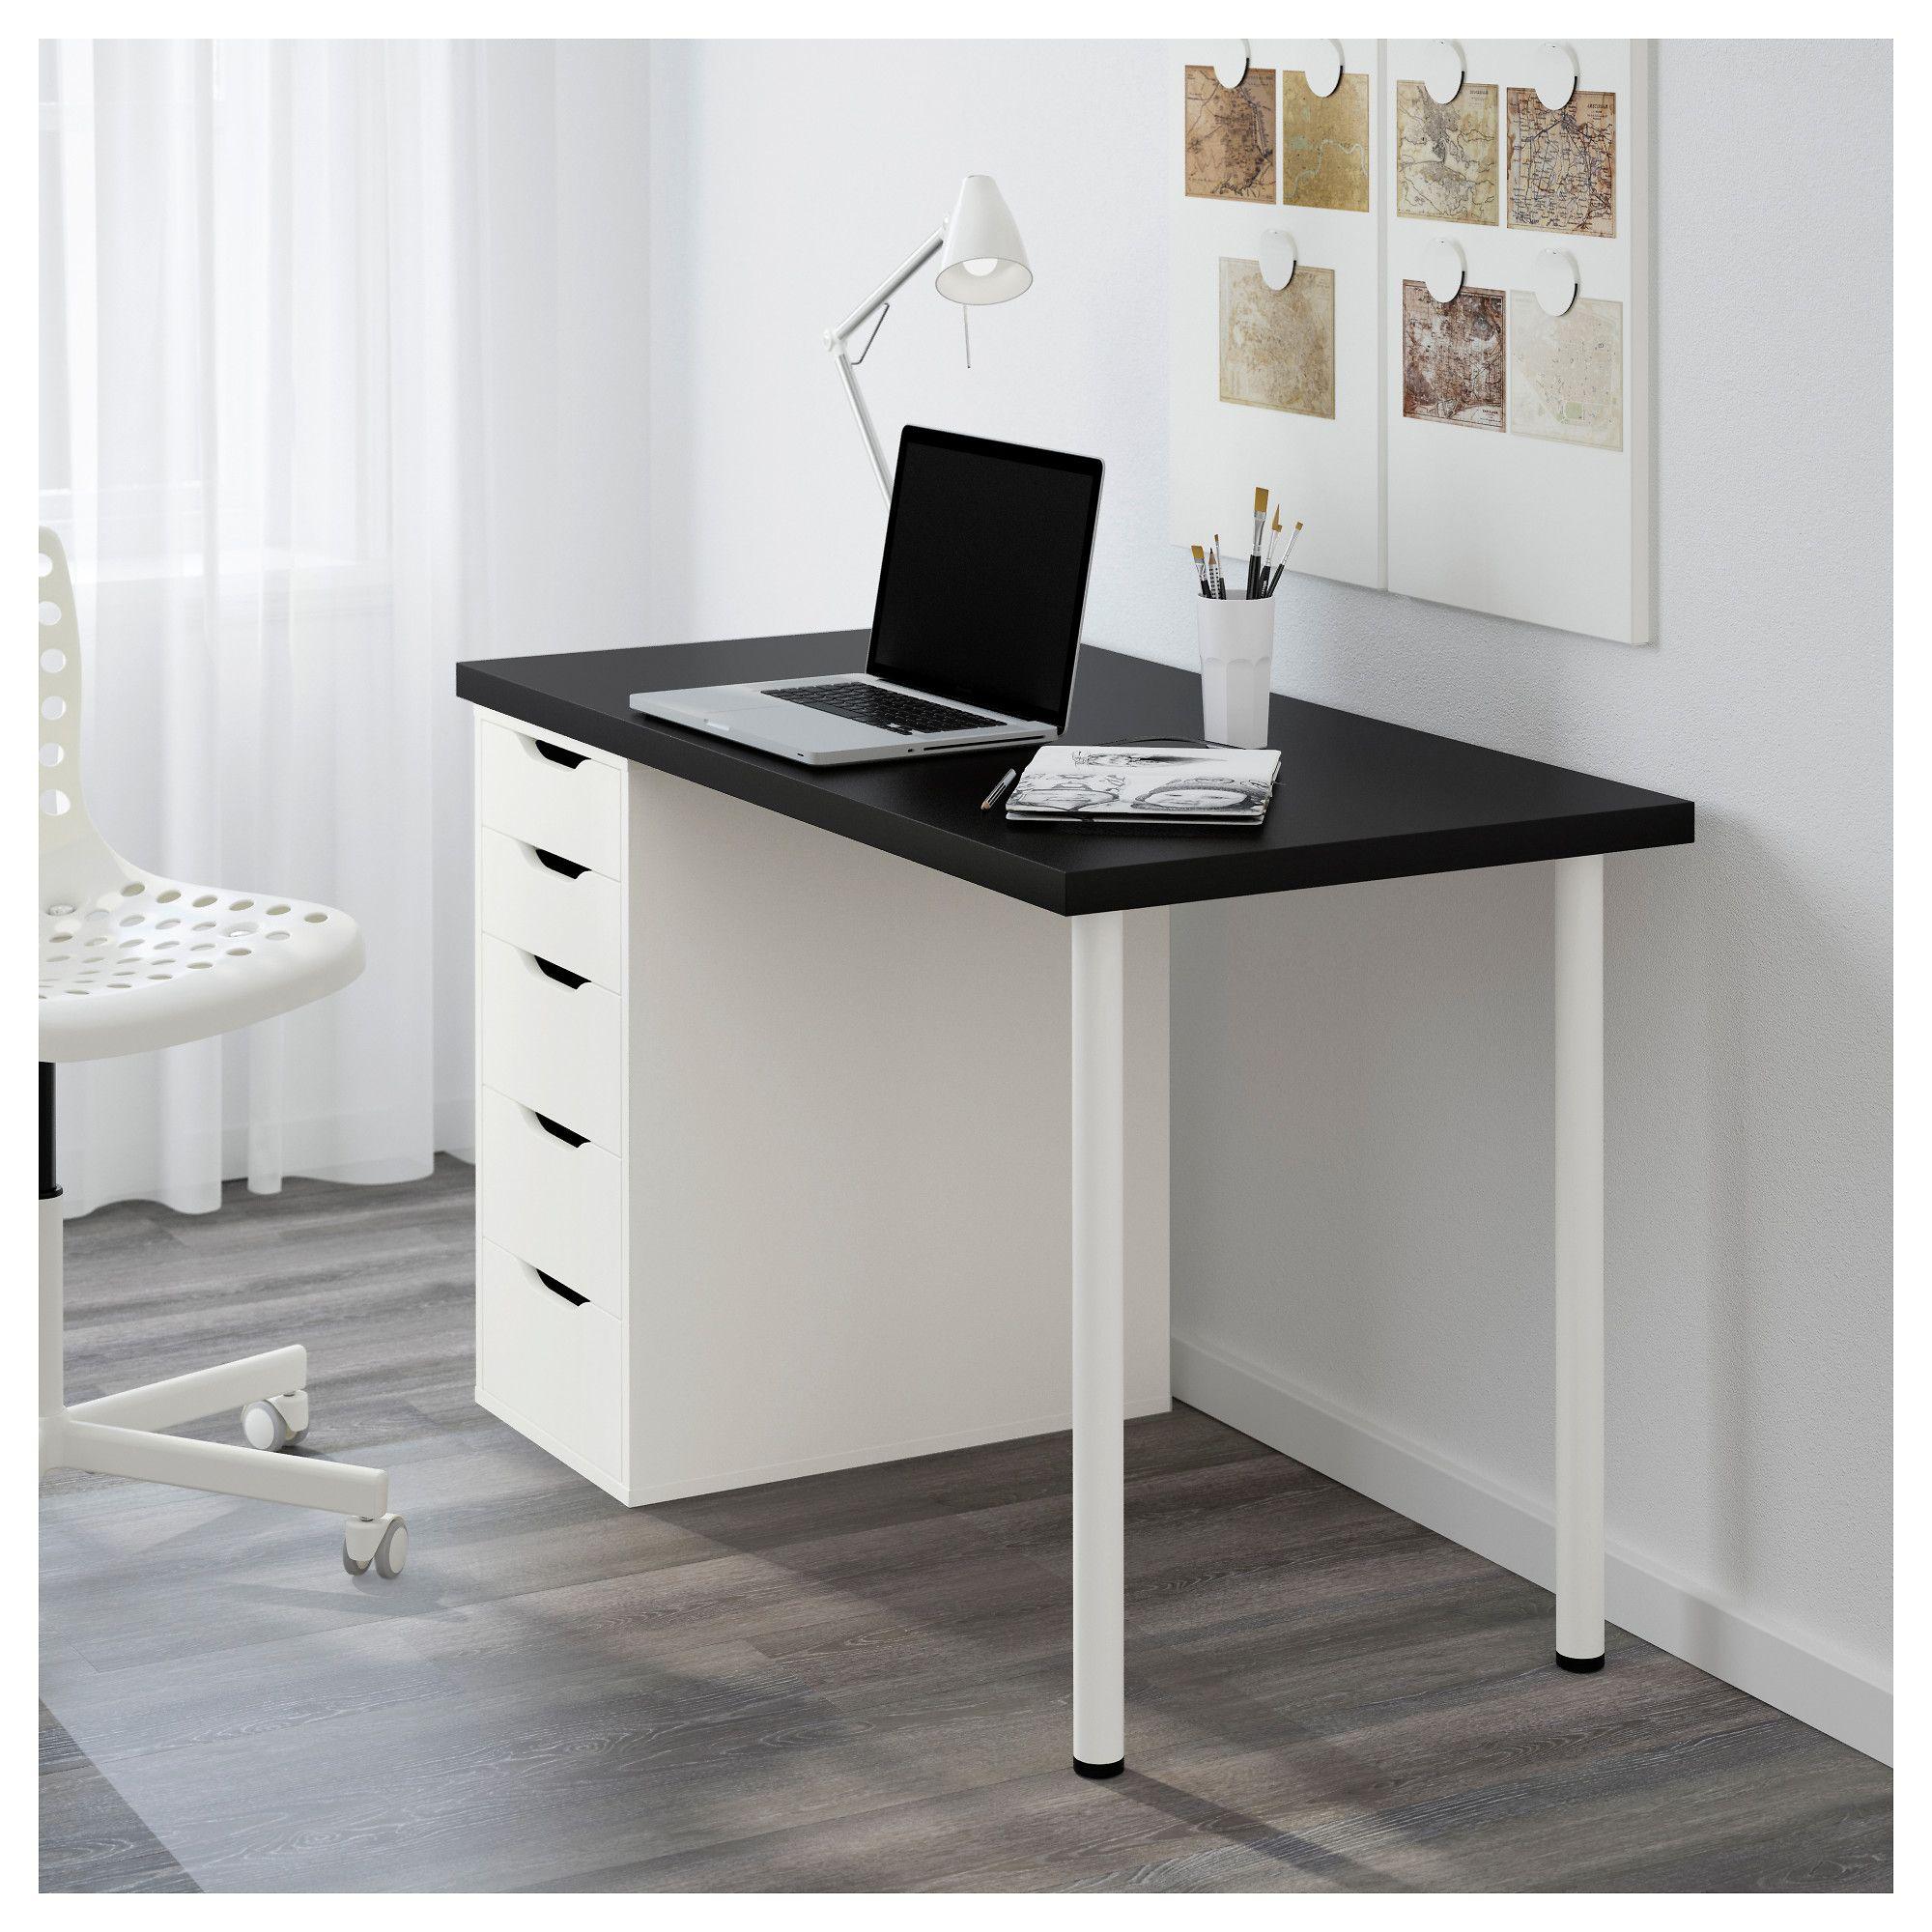 Linnmon Alex Table Black Brown White Ikea Ikea Ikea Desk Home Office Desks